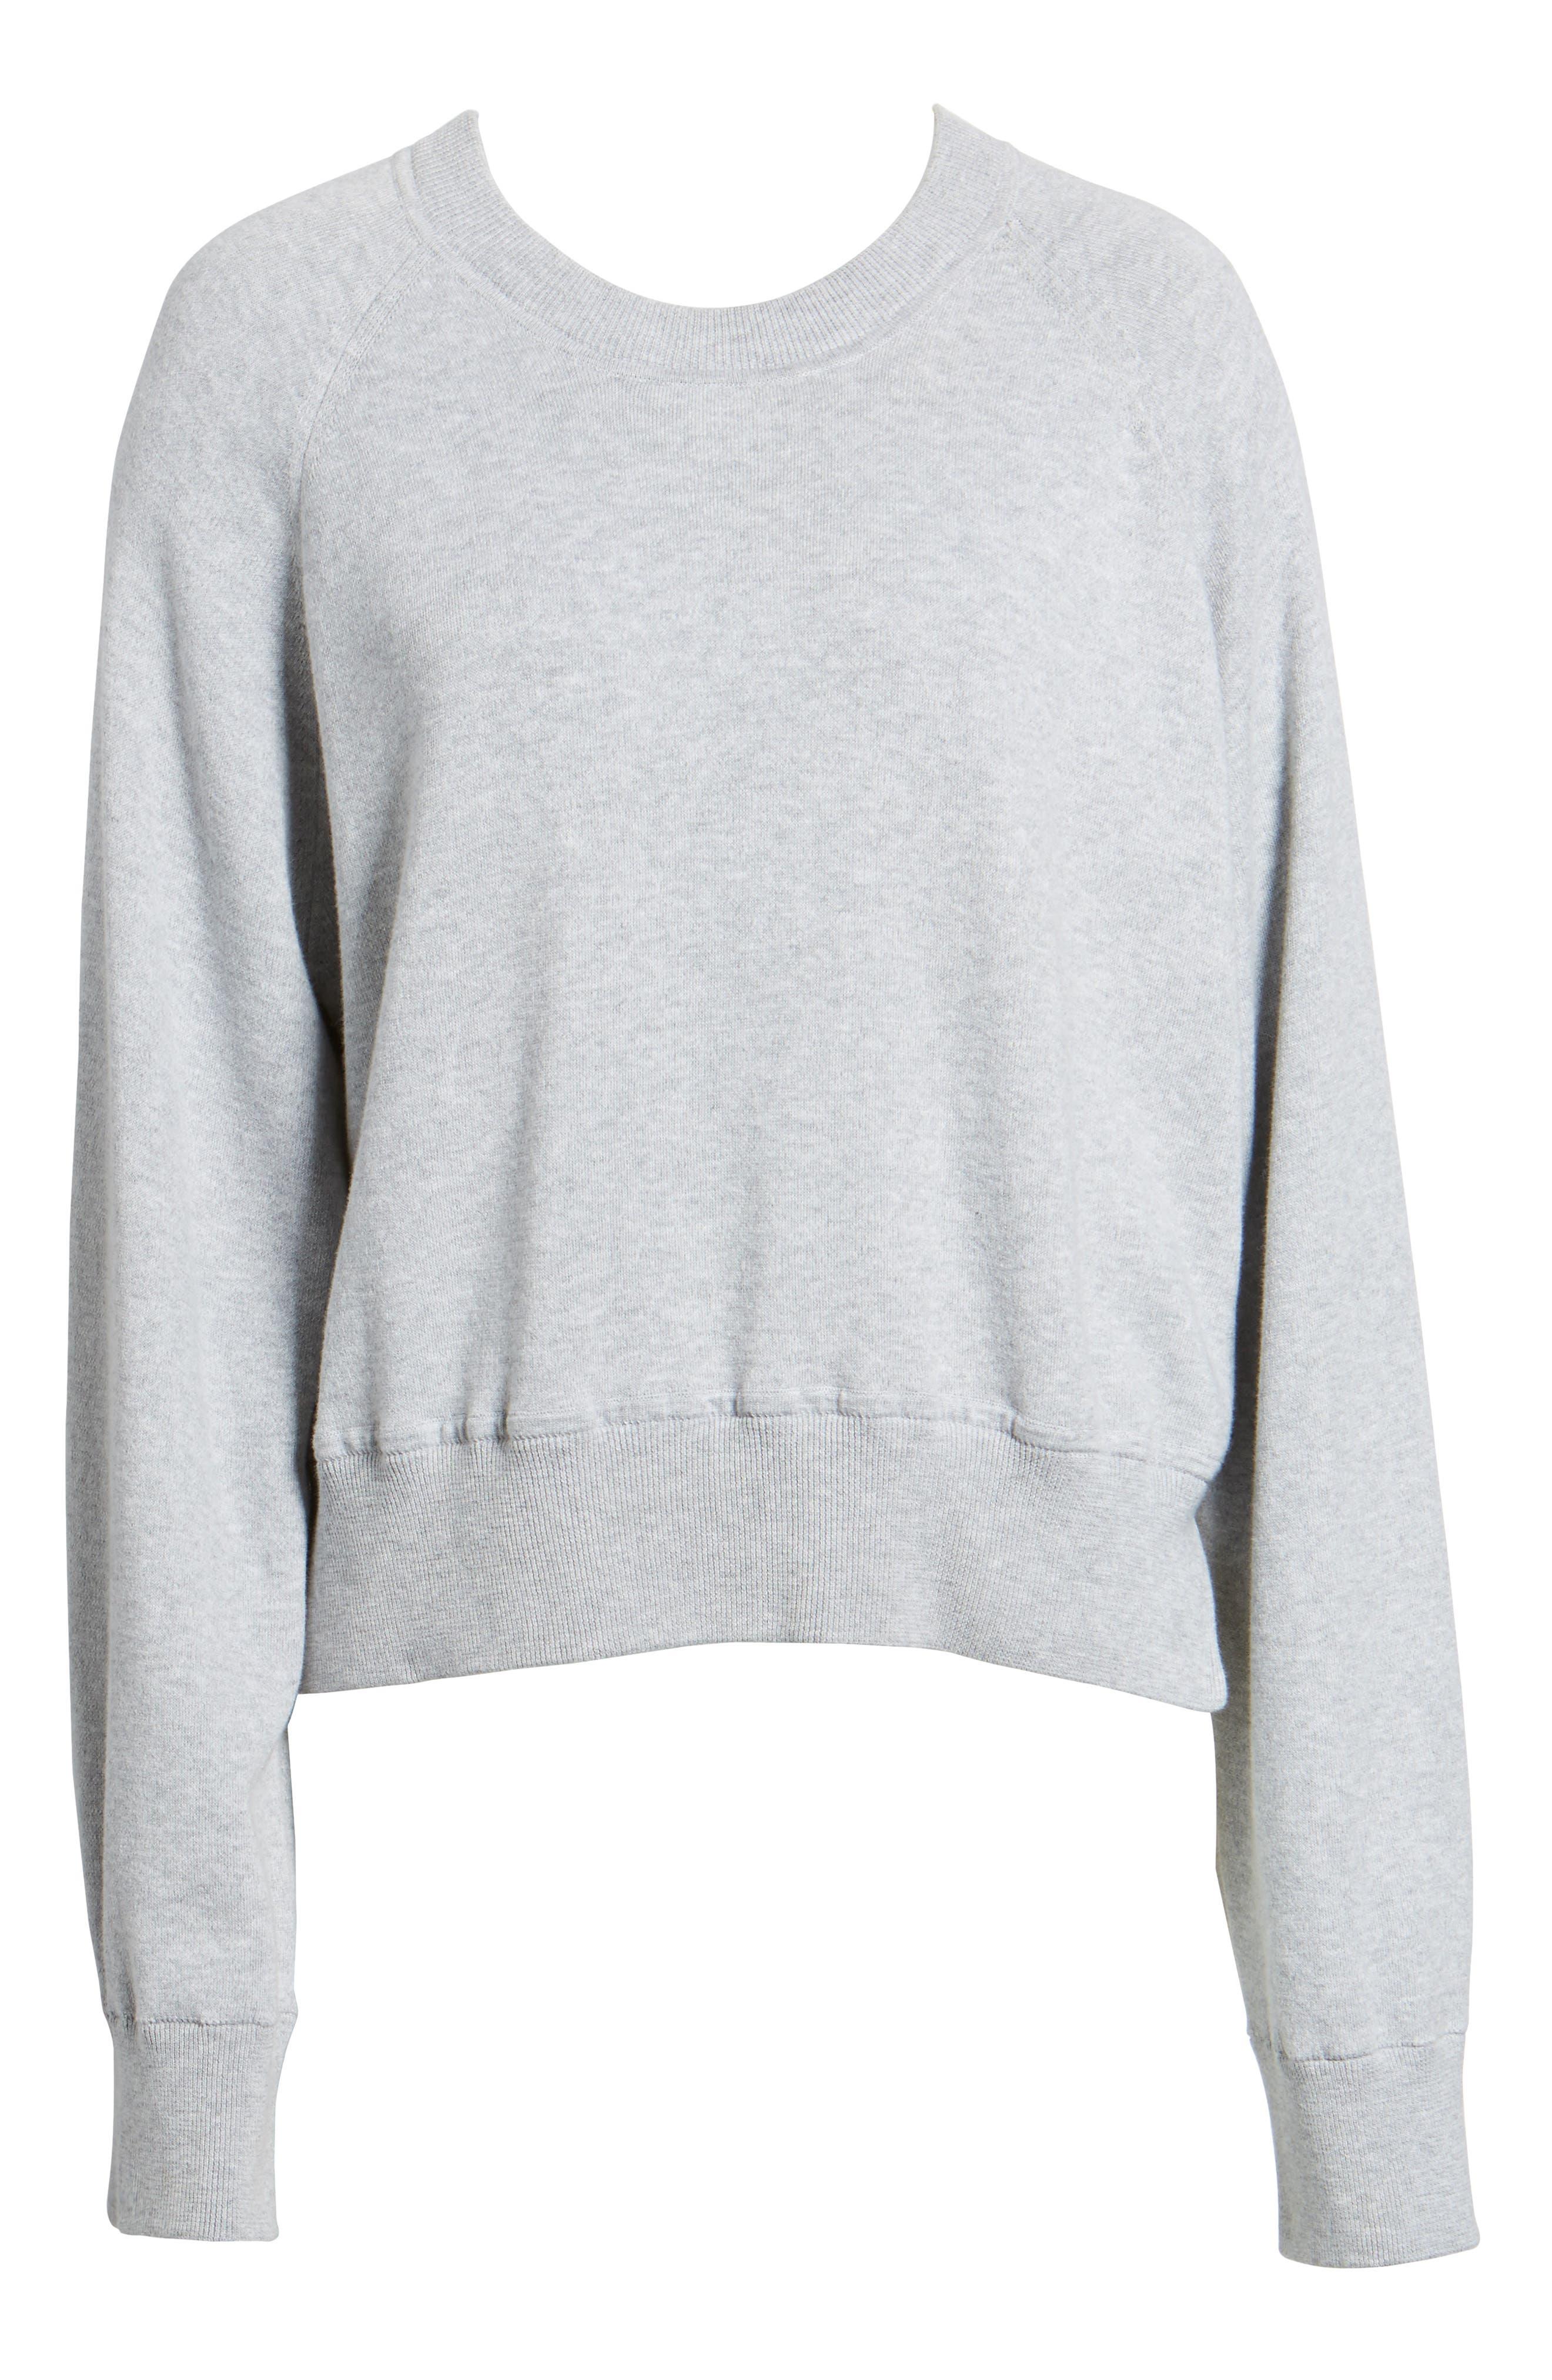 Lea Sweatshirt,                             Alternate thumbnail 6, color,                             Grey